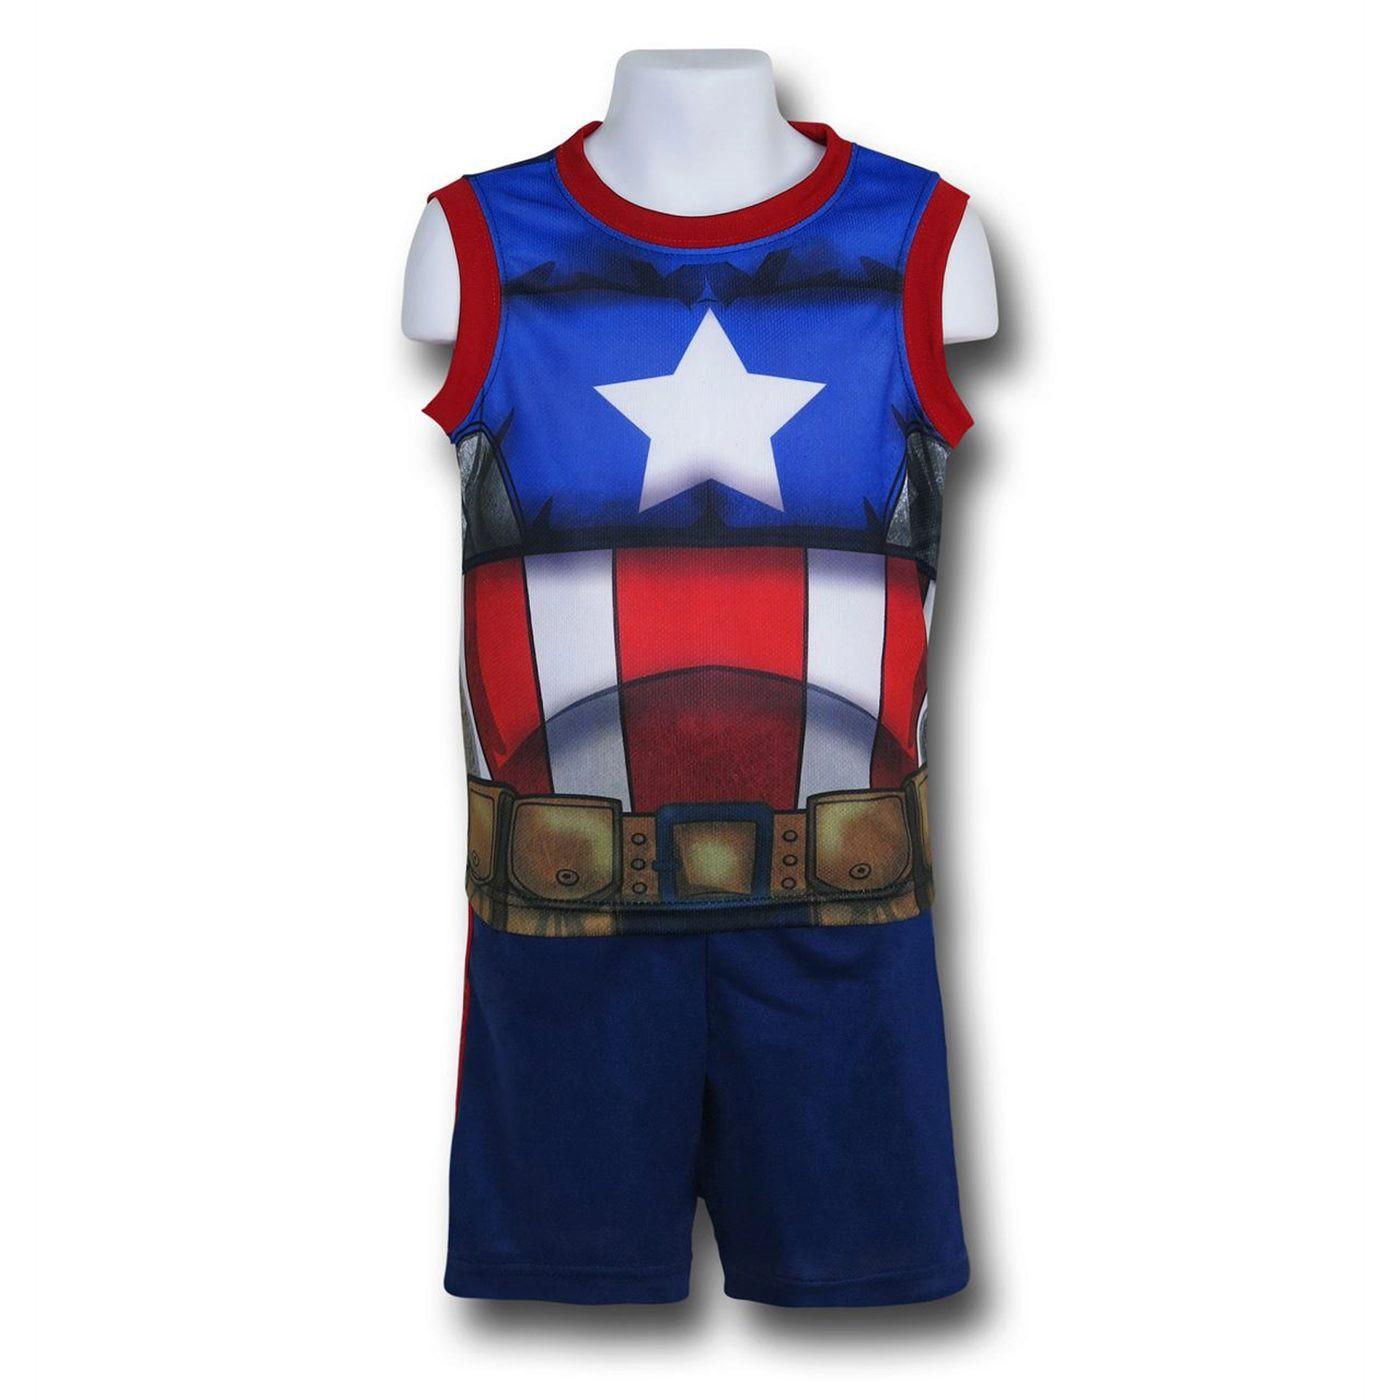 Captain America Costume Tank and Short Set